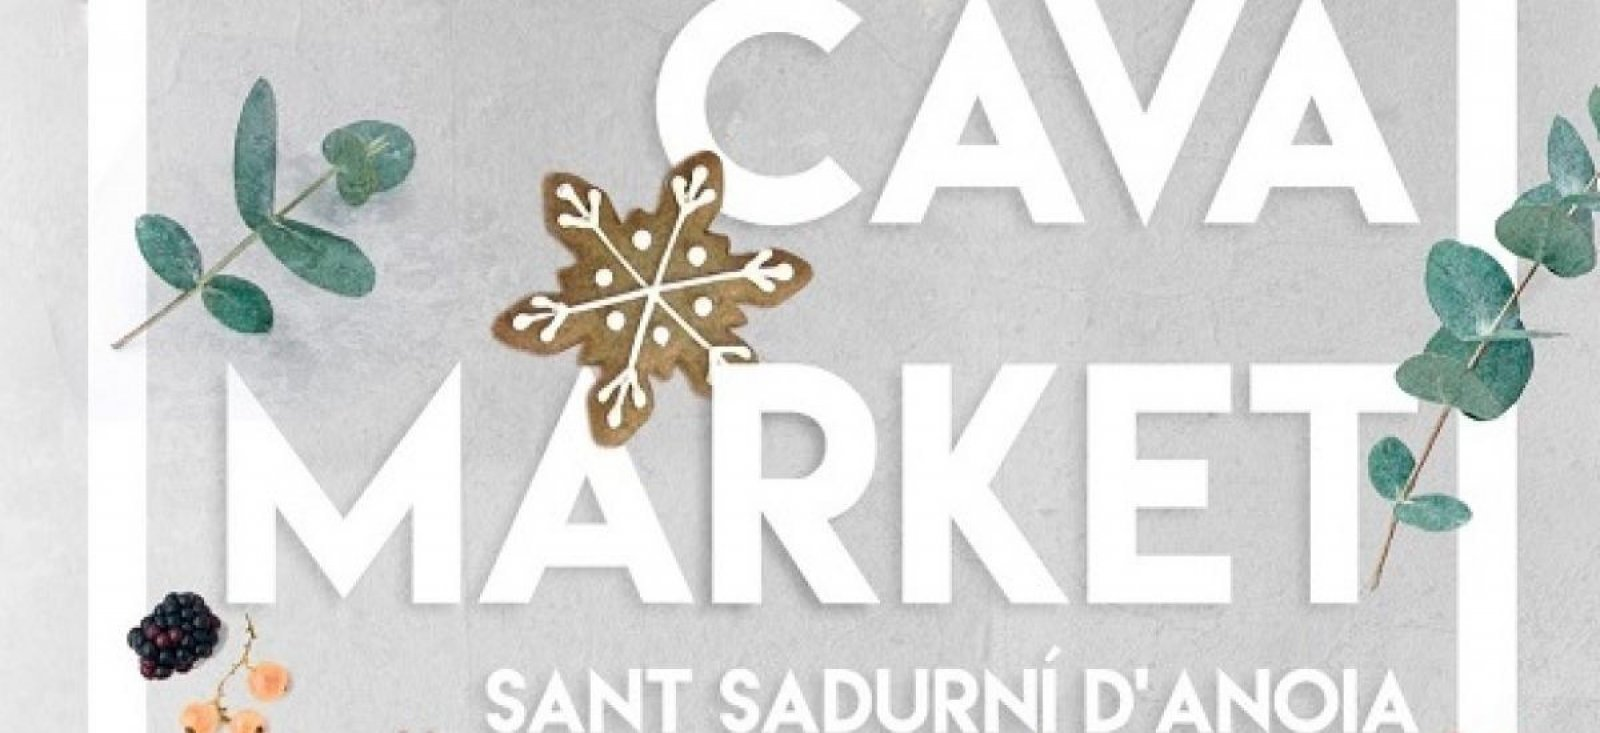 Cavamarket Sant Sadurní 2017